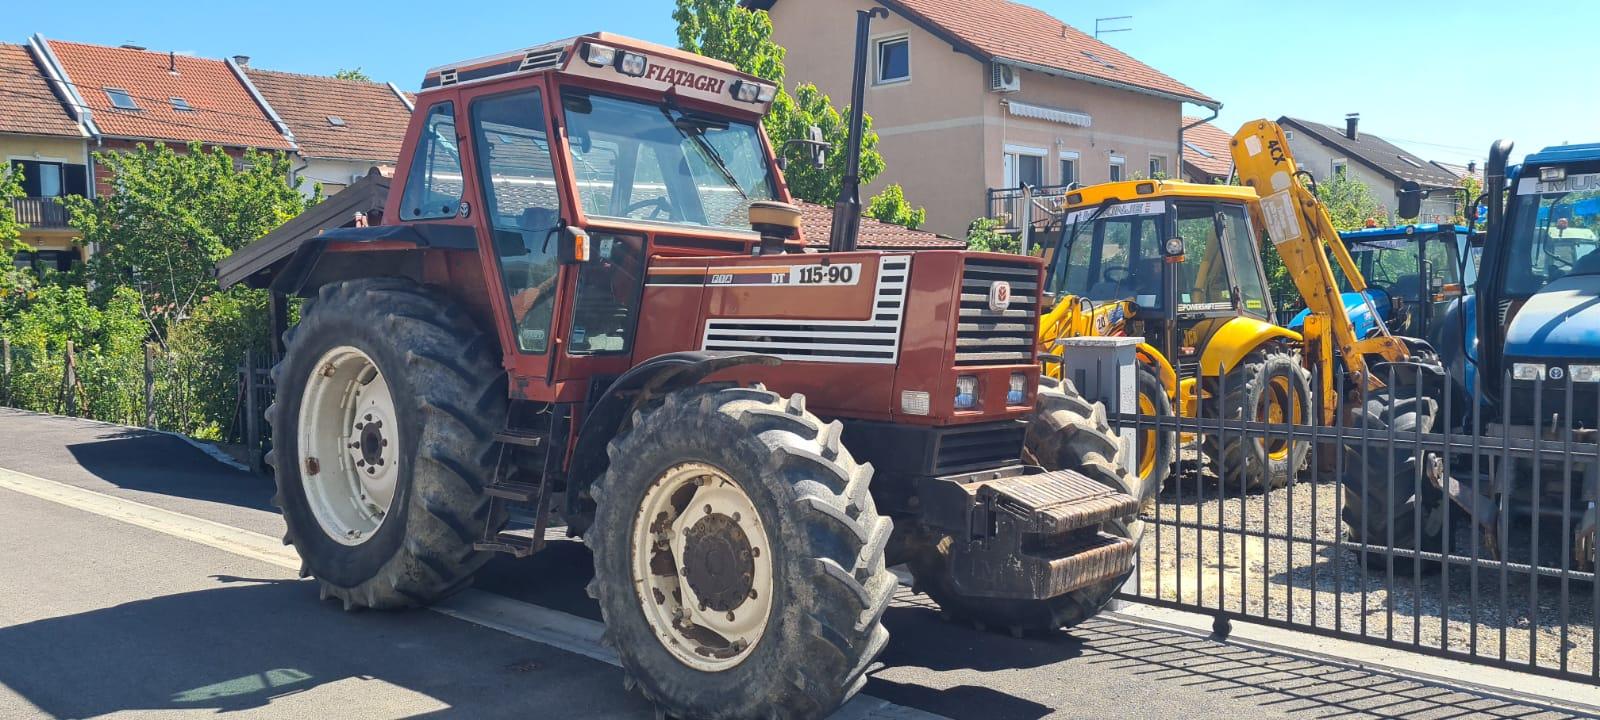 FIAT FIATAGRI 115-90